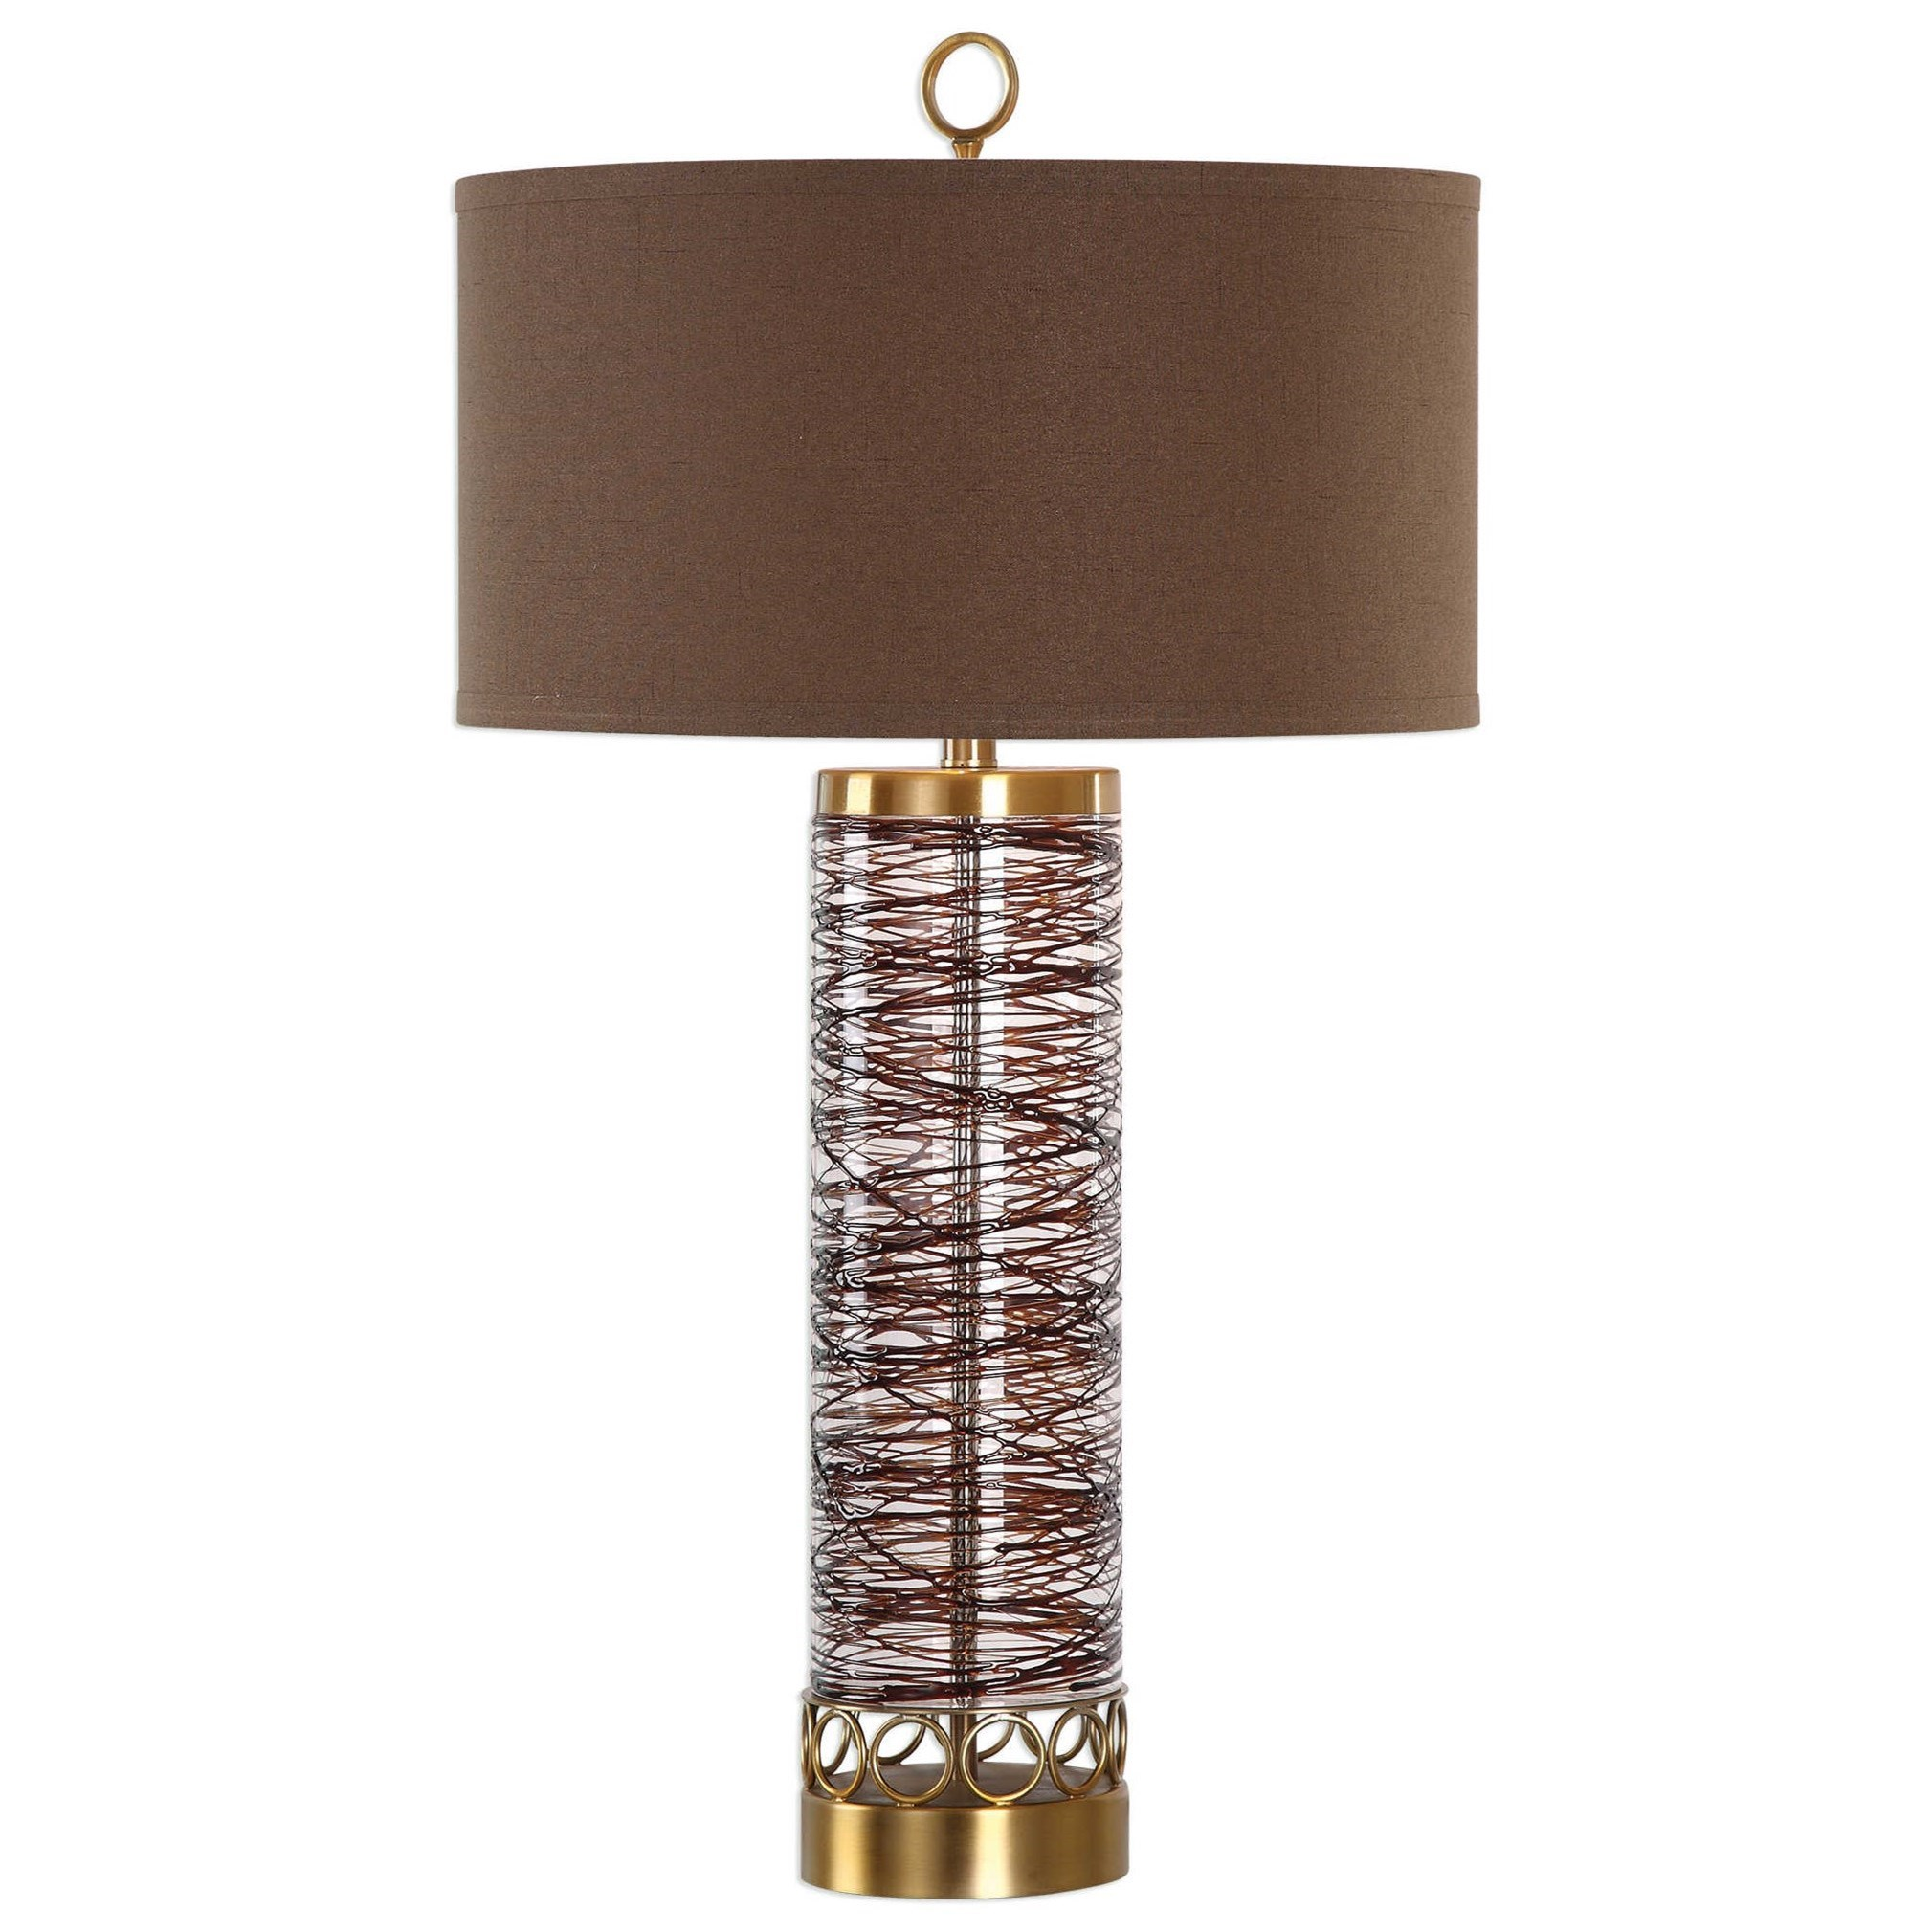 Seaver Spun Glass Table Lamp